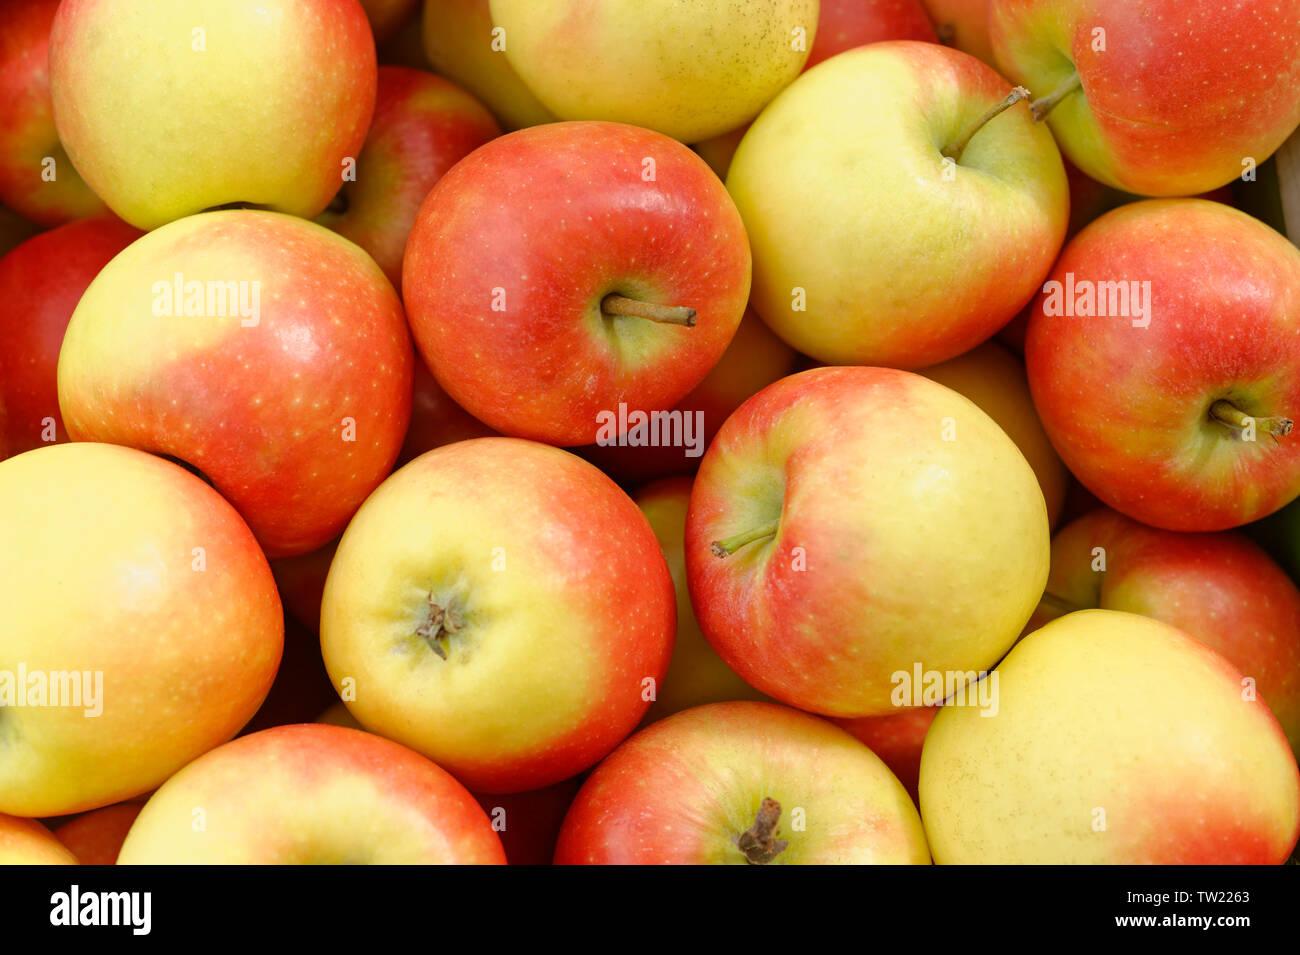 Kanzi Sweet Apples - Stock Image